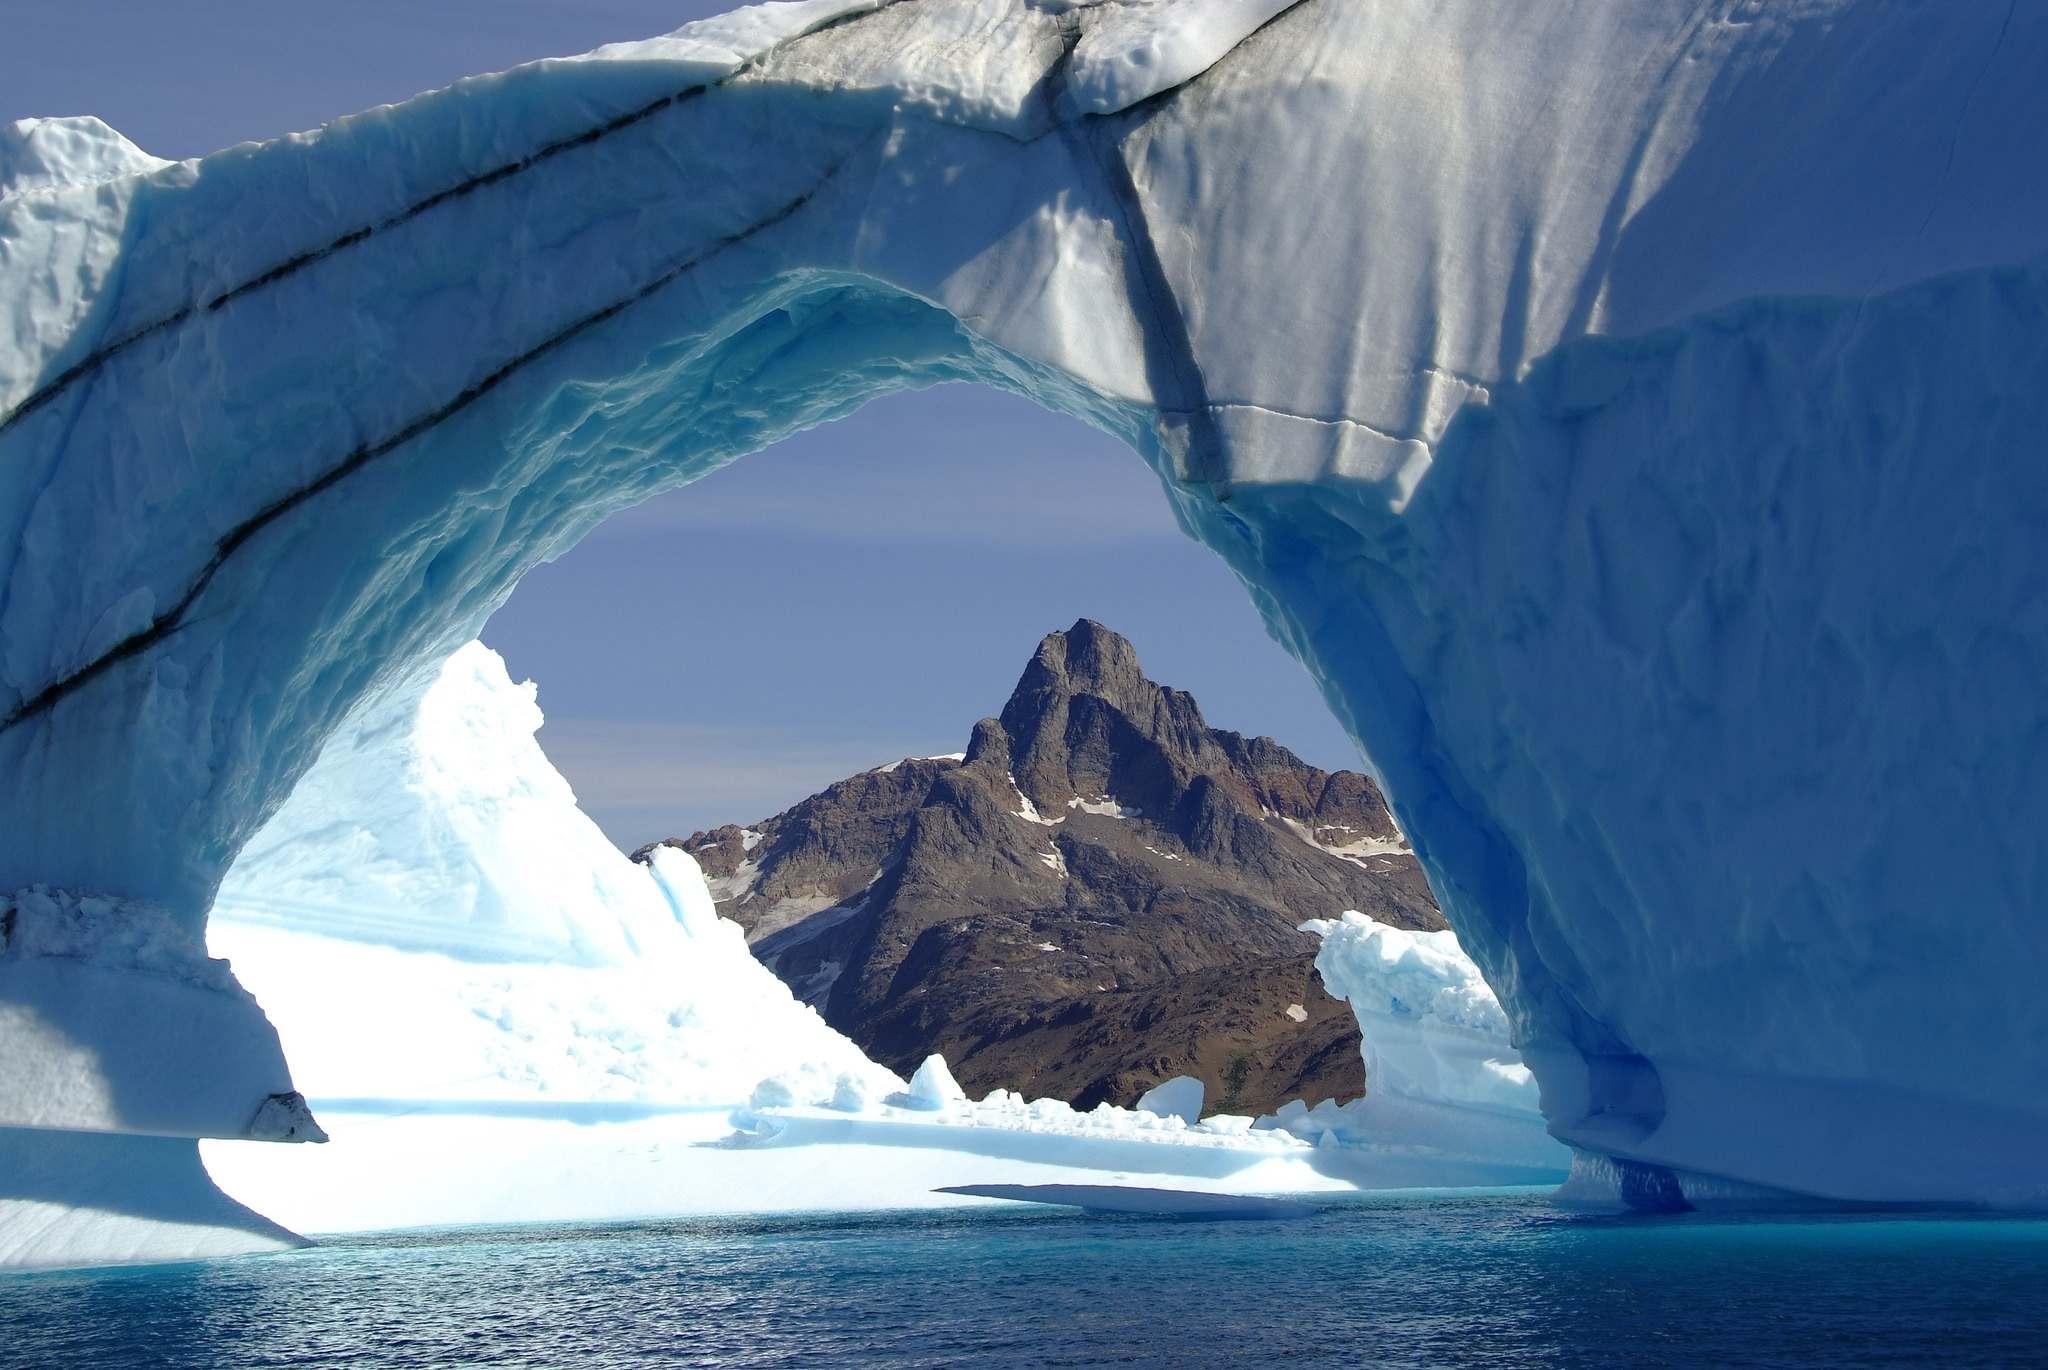 icefjord ilulissat2 The icefjord in Ilulissat, Greenland